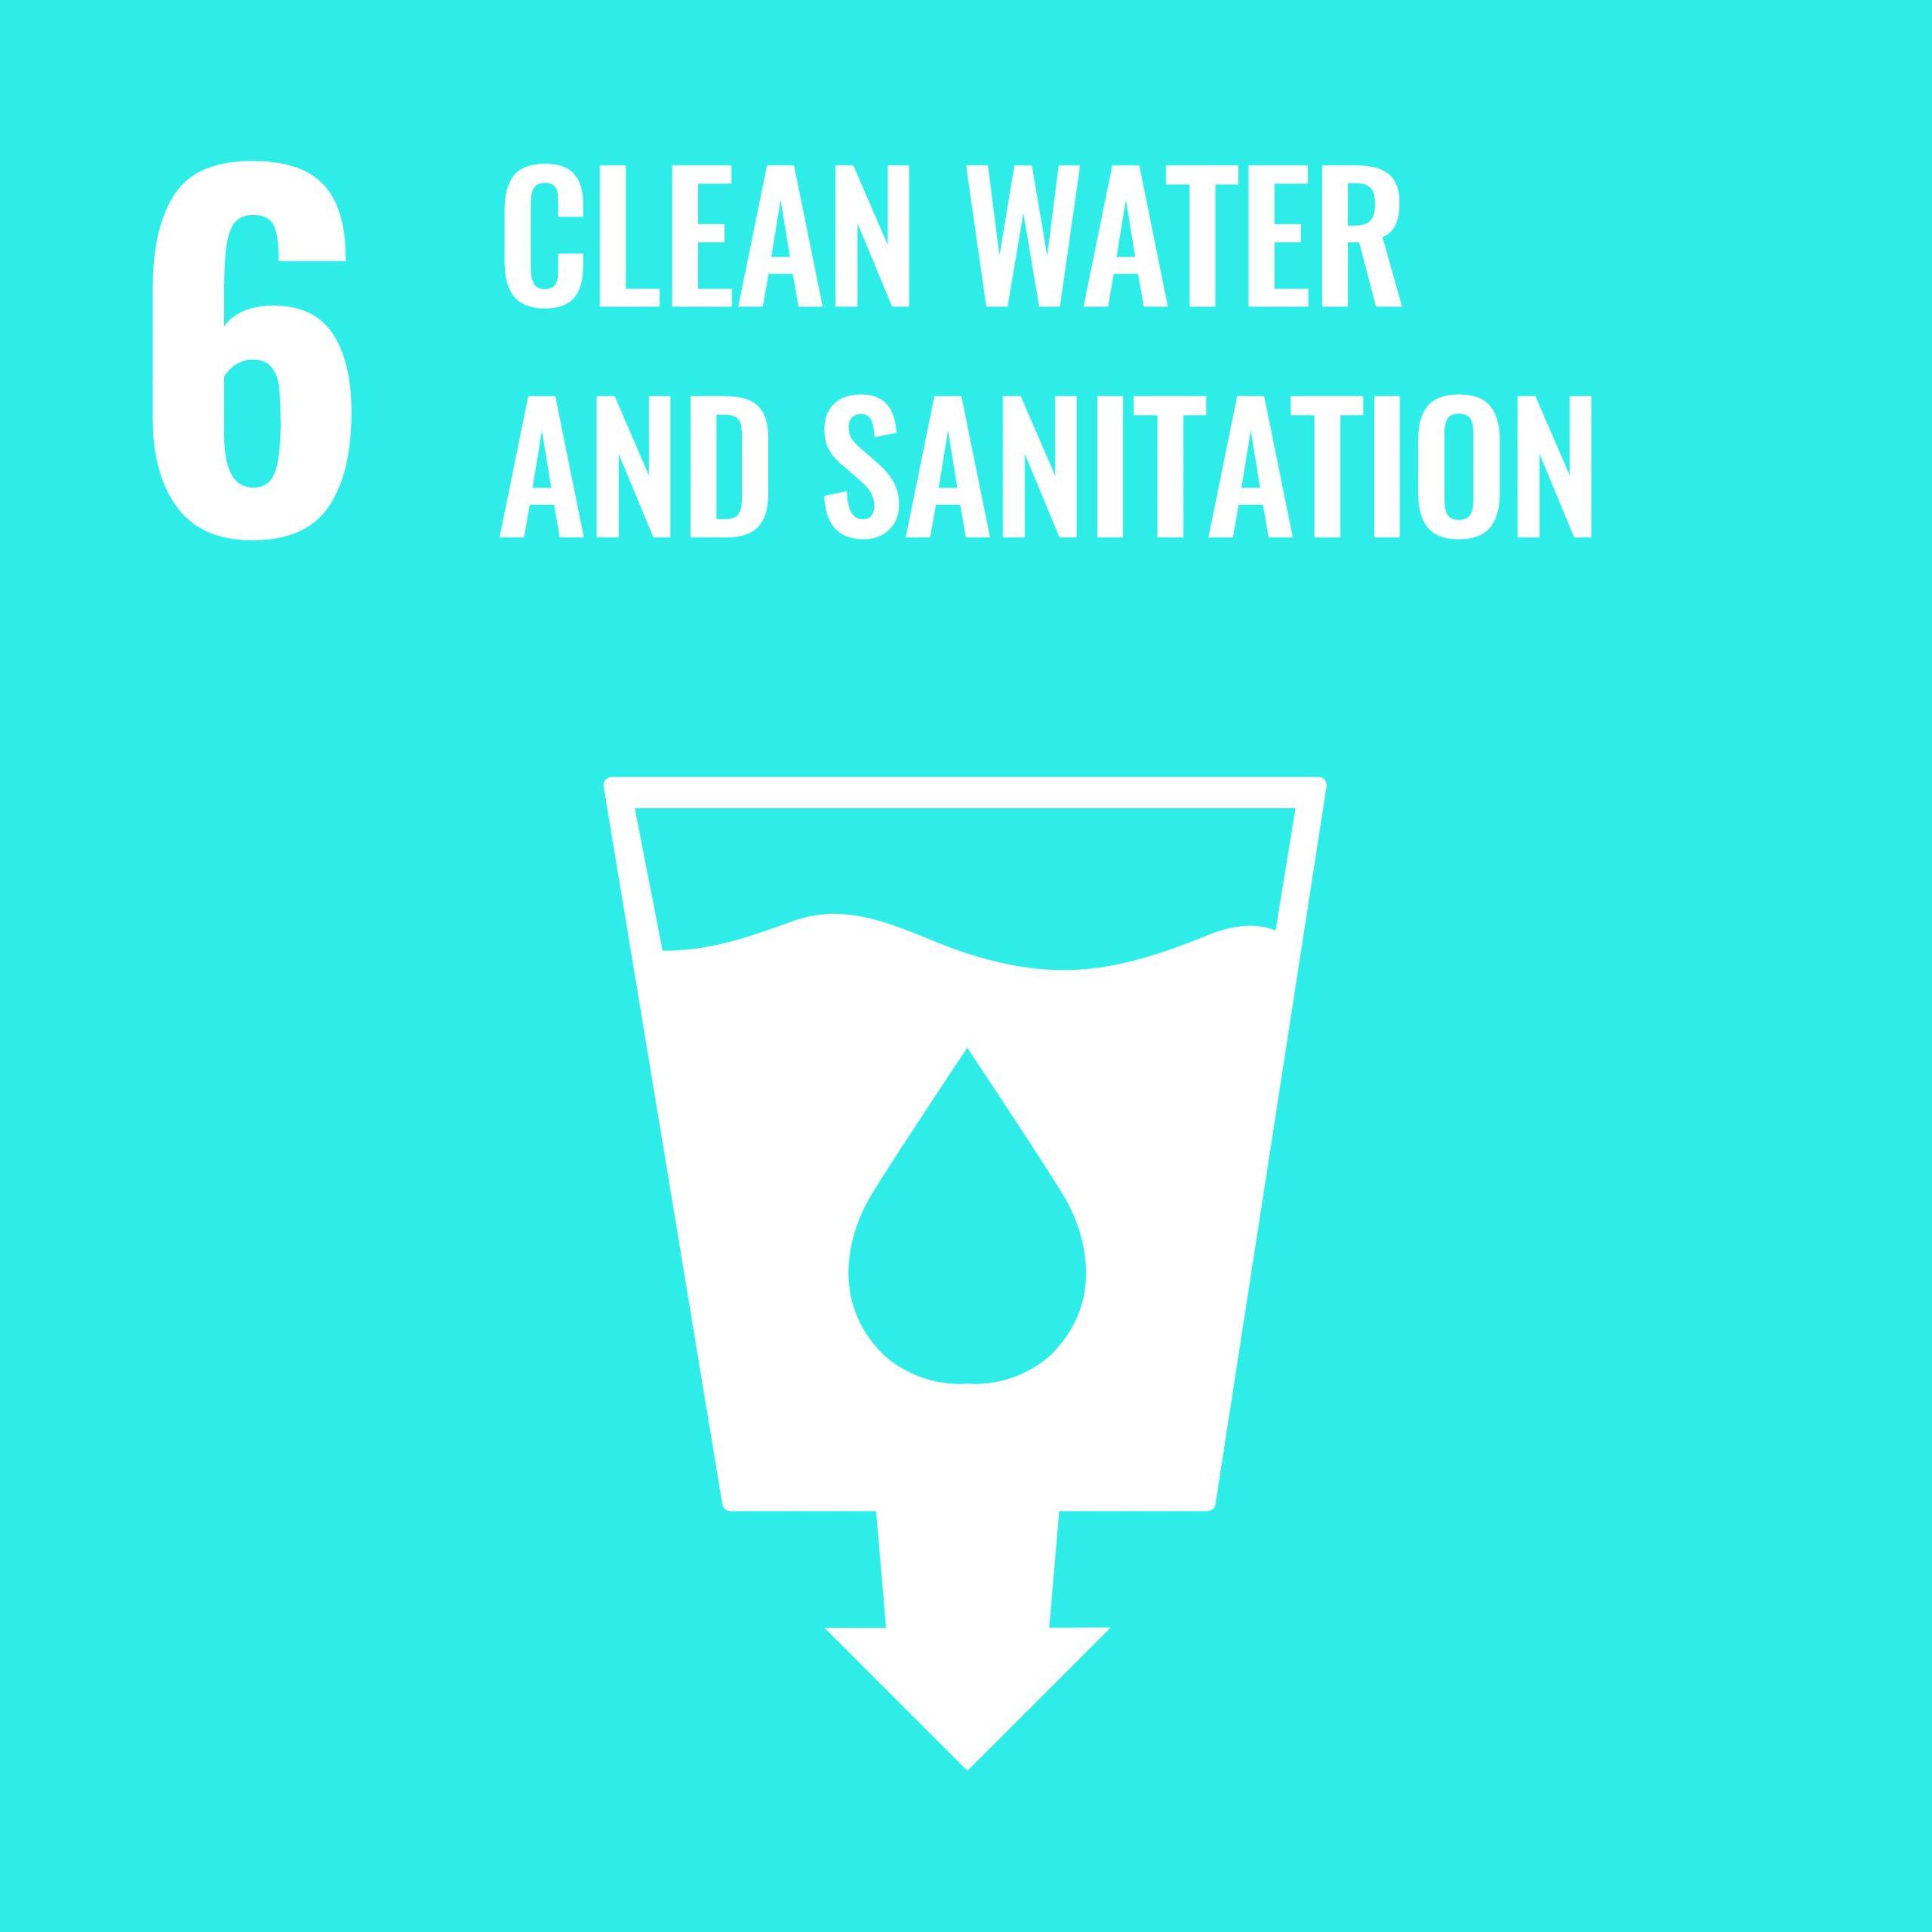 Clean Water and Sanitation - SDG 6